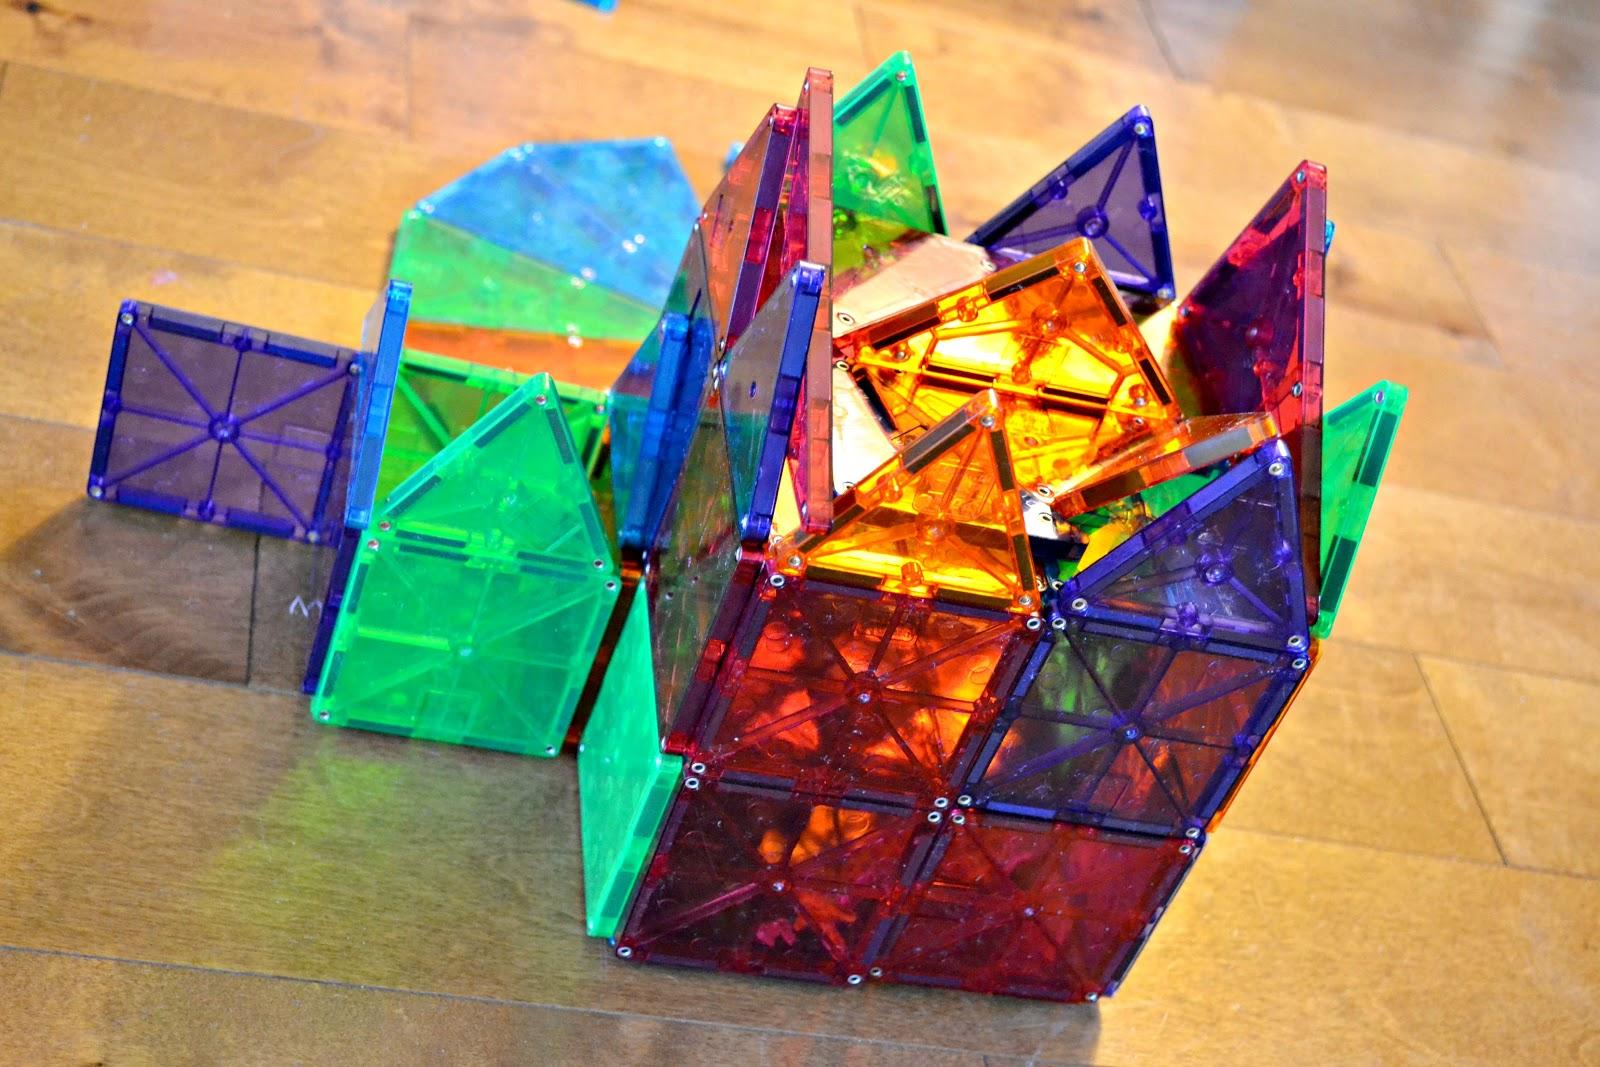 Magna Tiles magnetic building toy for kids